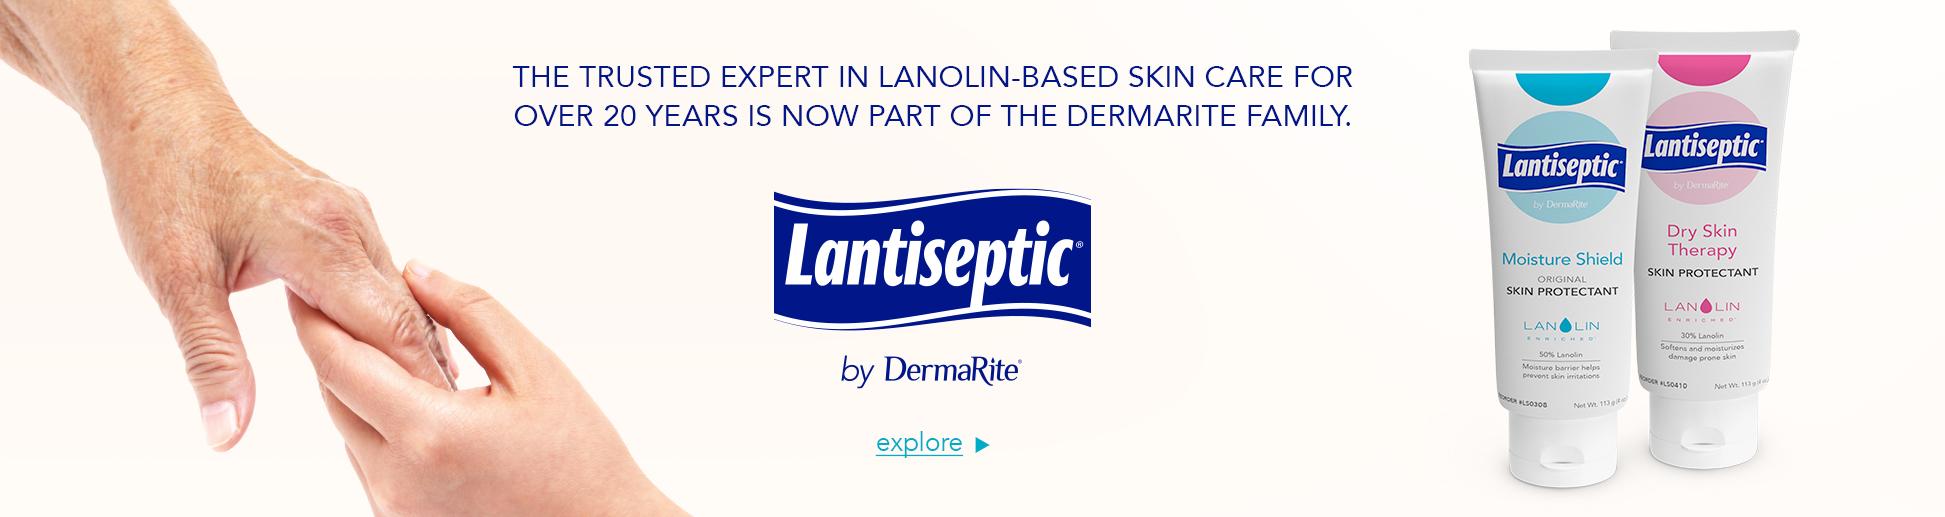 Website Main Banner Lantiseptic